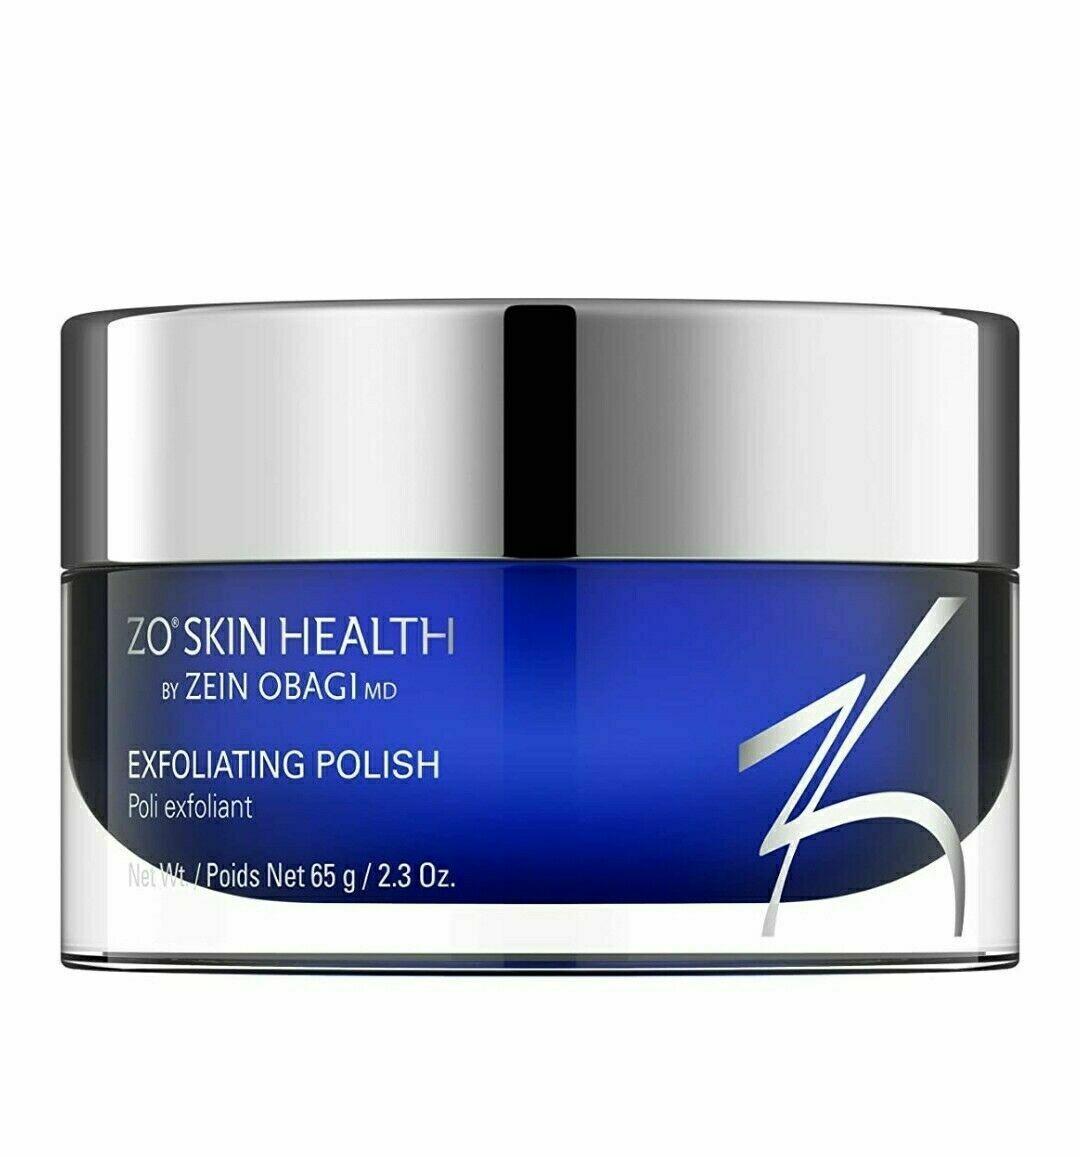 ZO Skin Health Exfoliating Polish